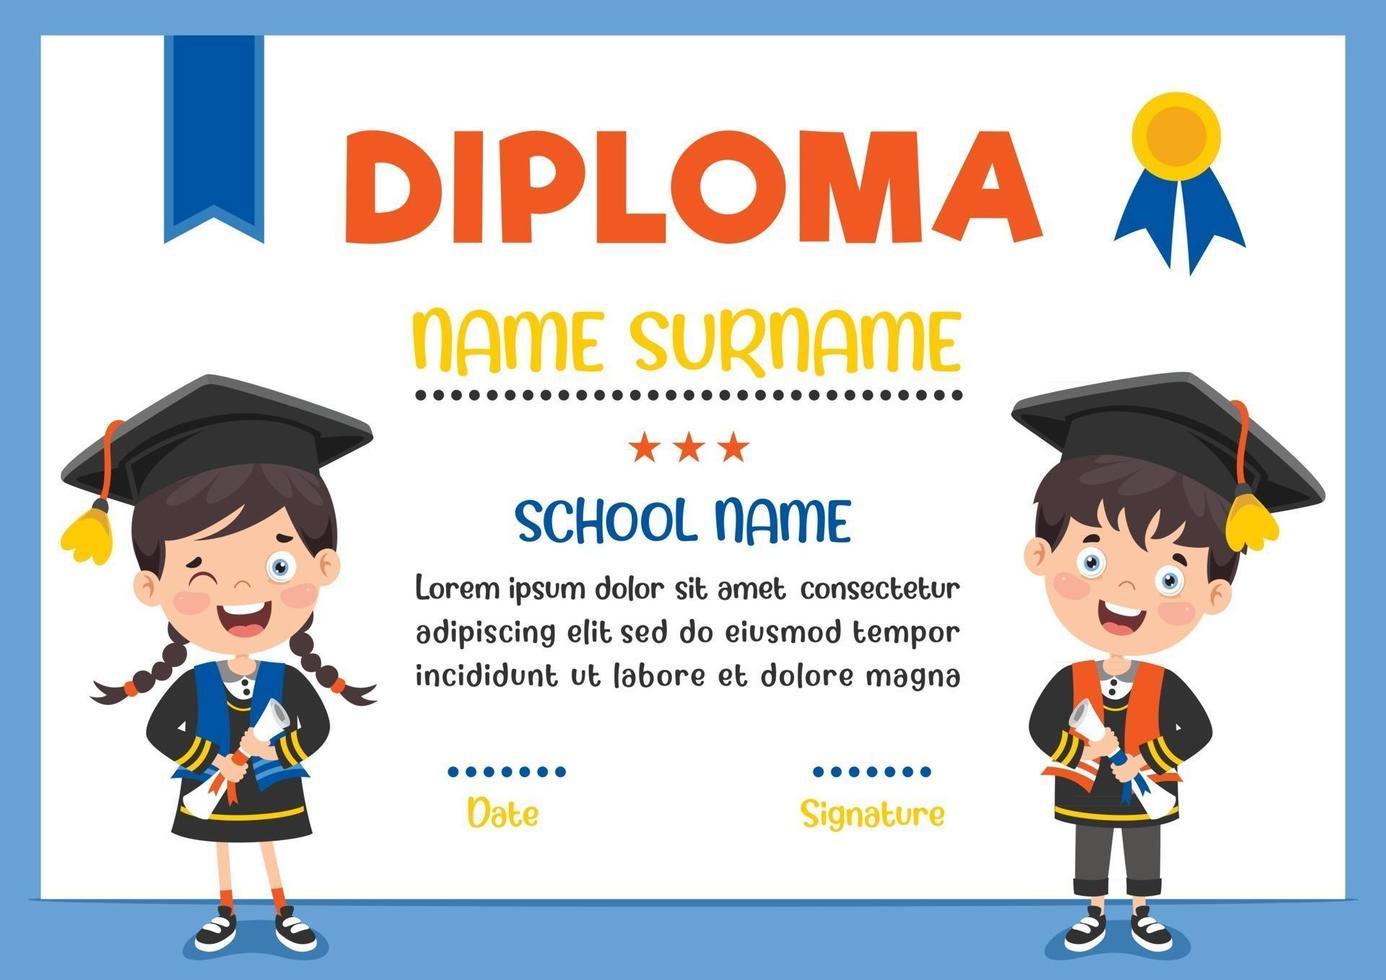 Diploma Certificate For Preschool And Elementary School Kids vector